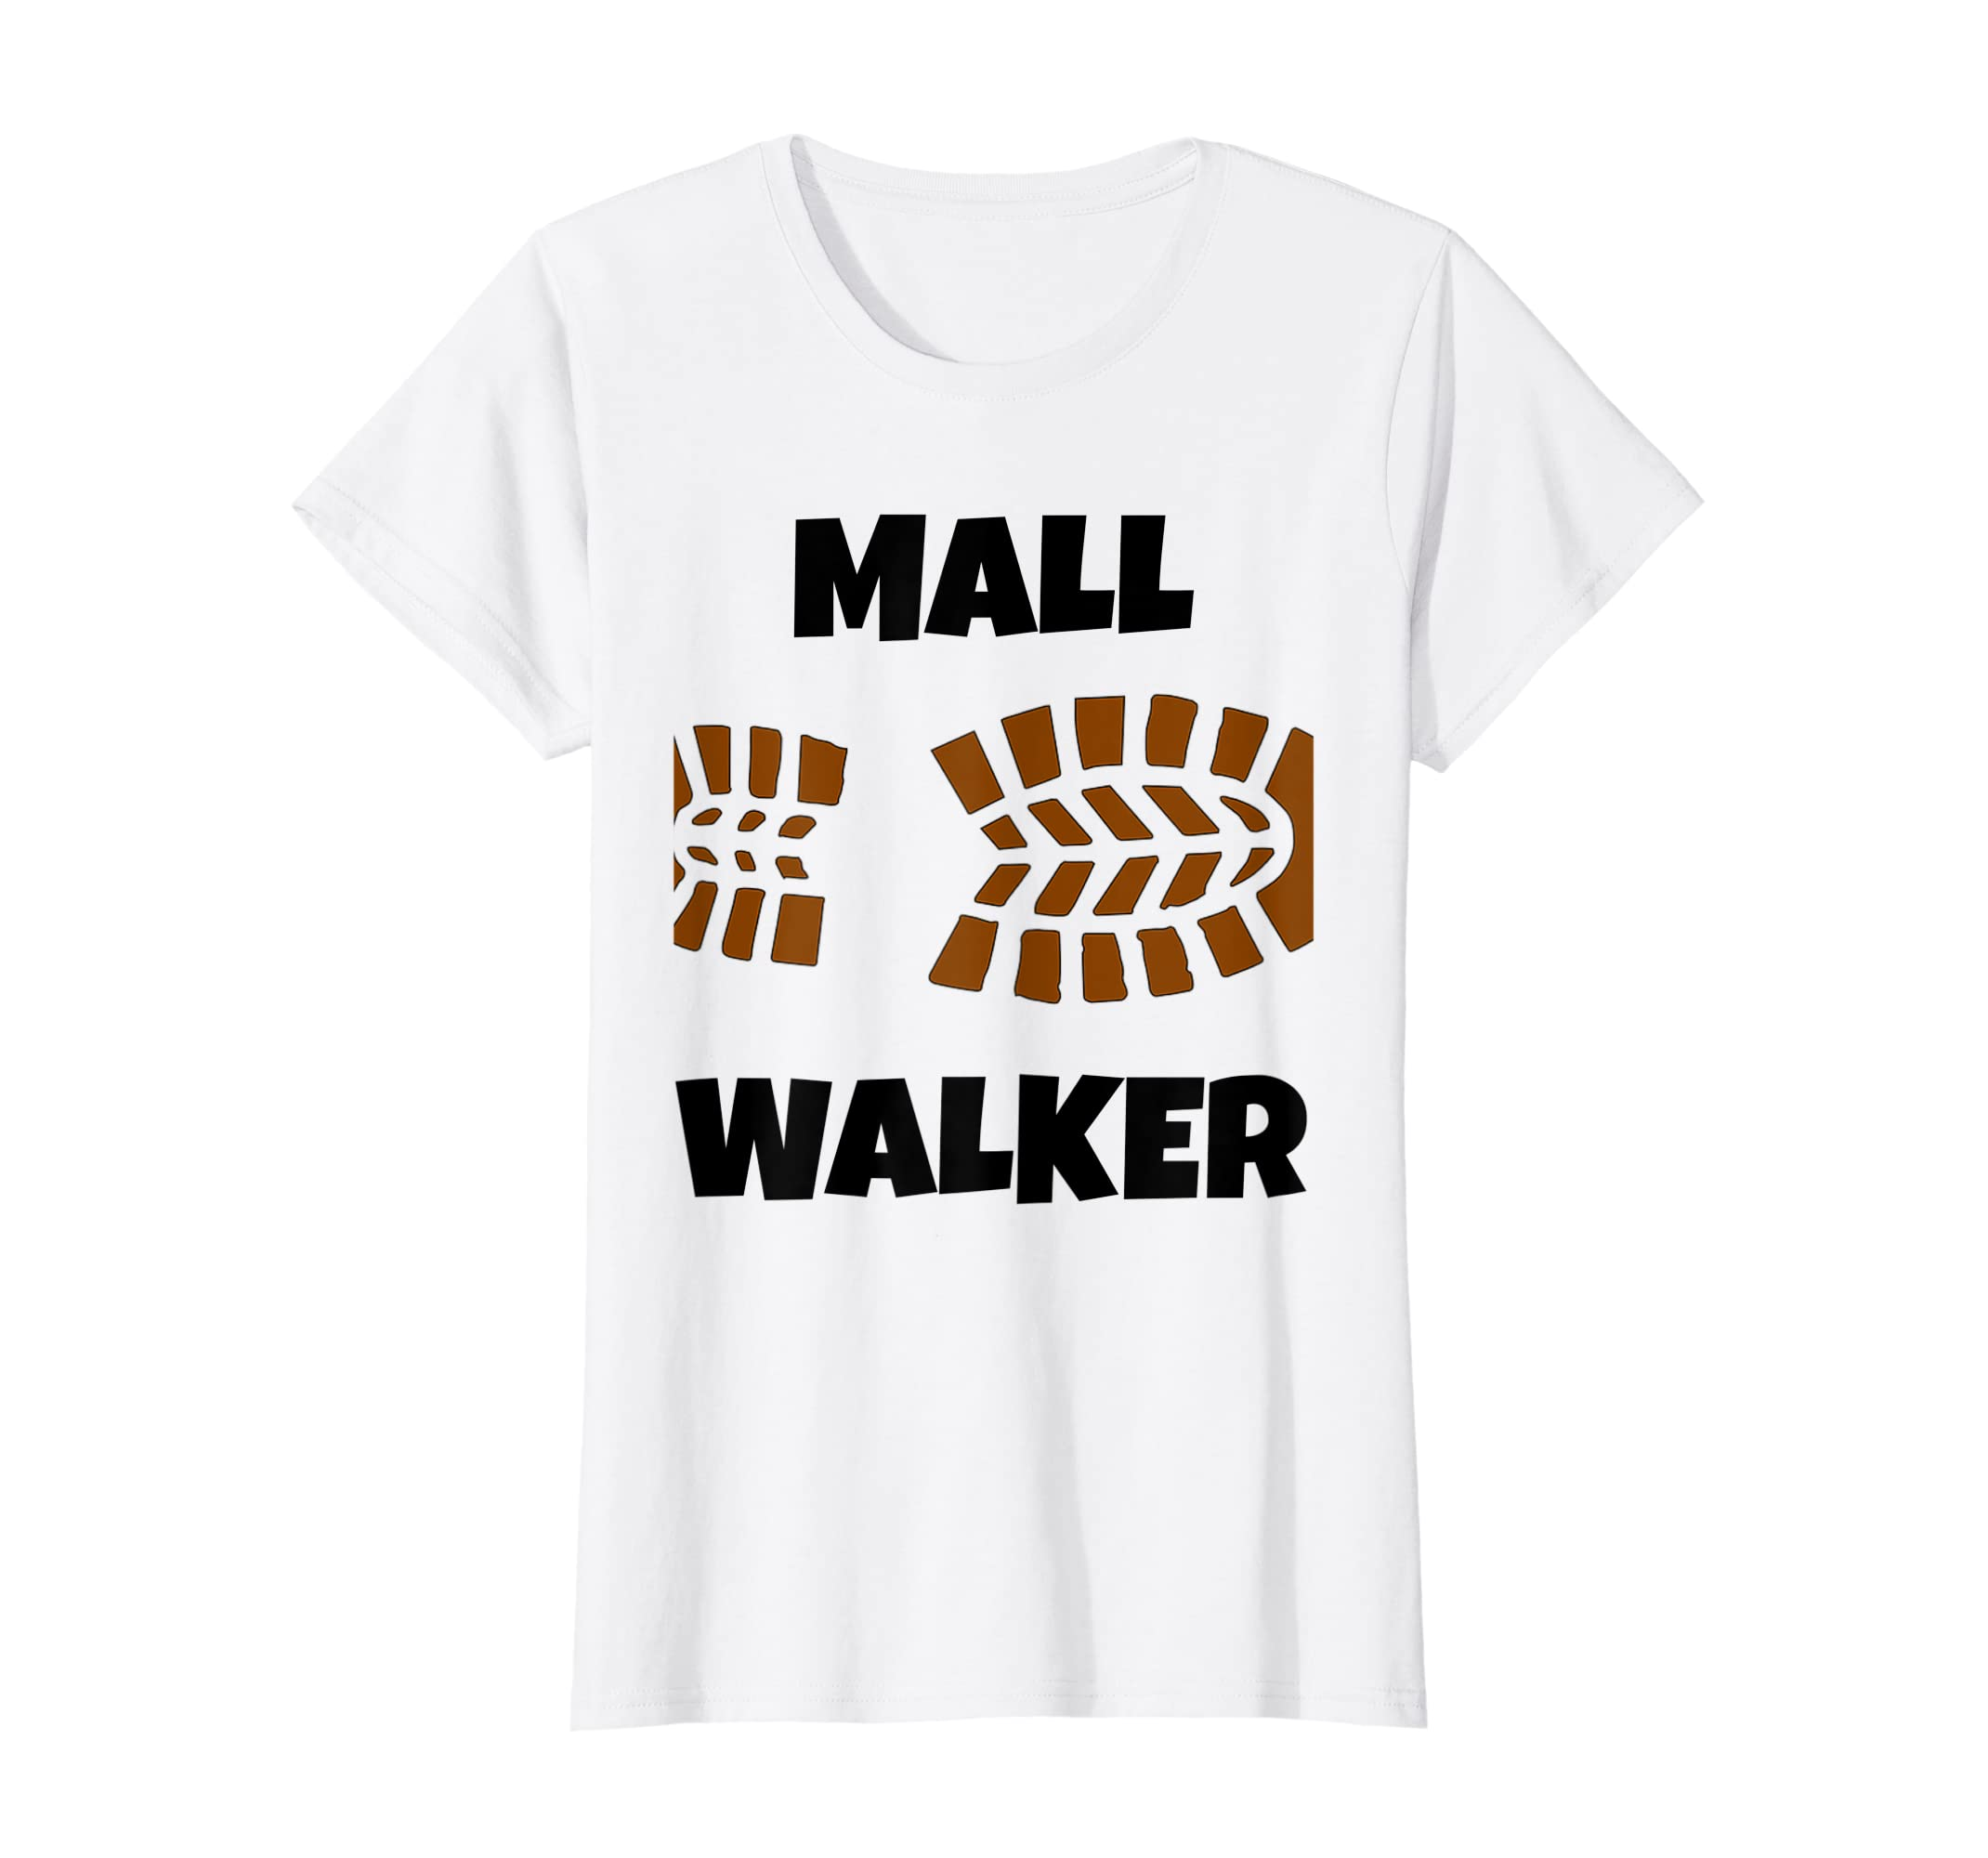 eb9e2e393adf5 Amazon.com: MALL WALKER SHIRT: Clothing